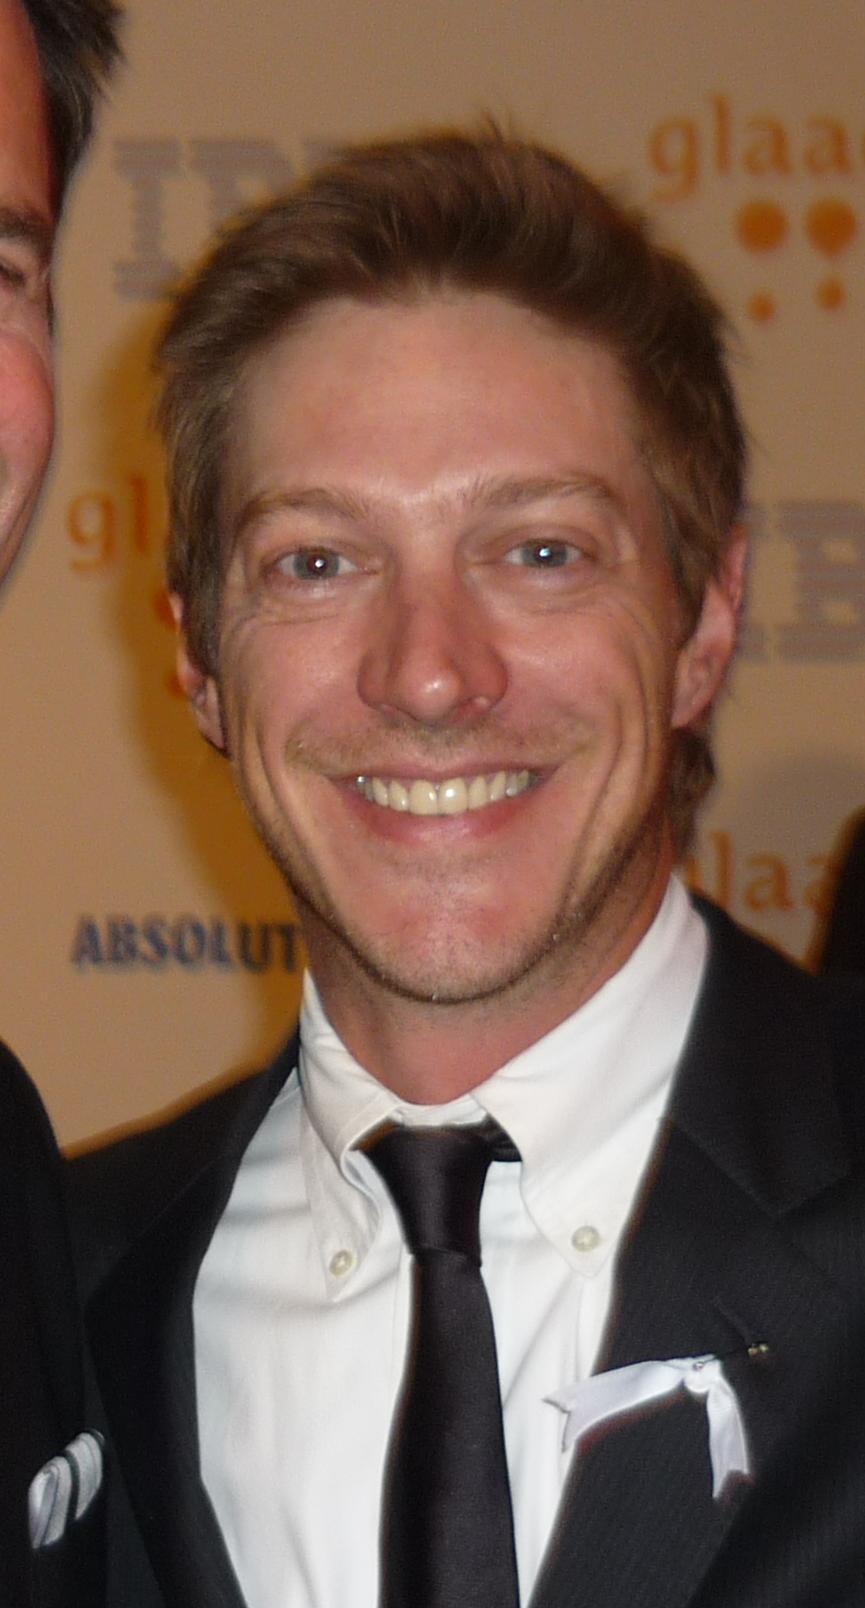 Kevin Rahm - Wikipedia